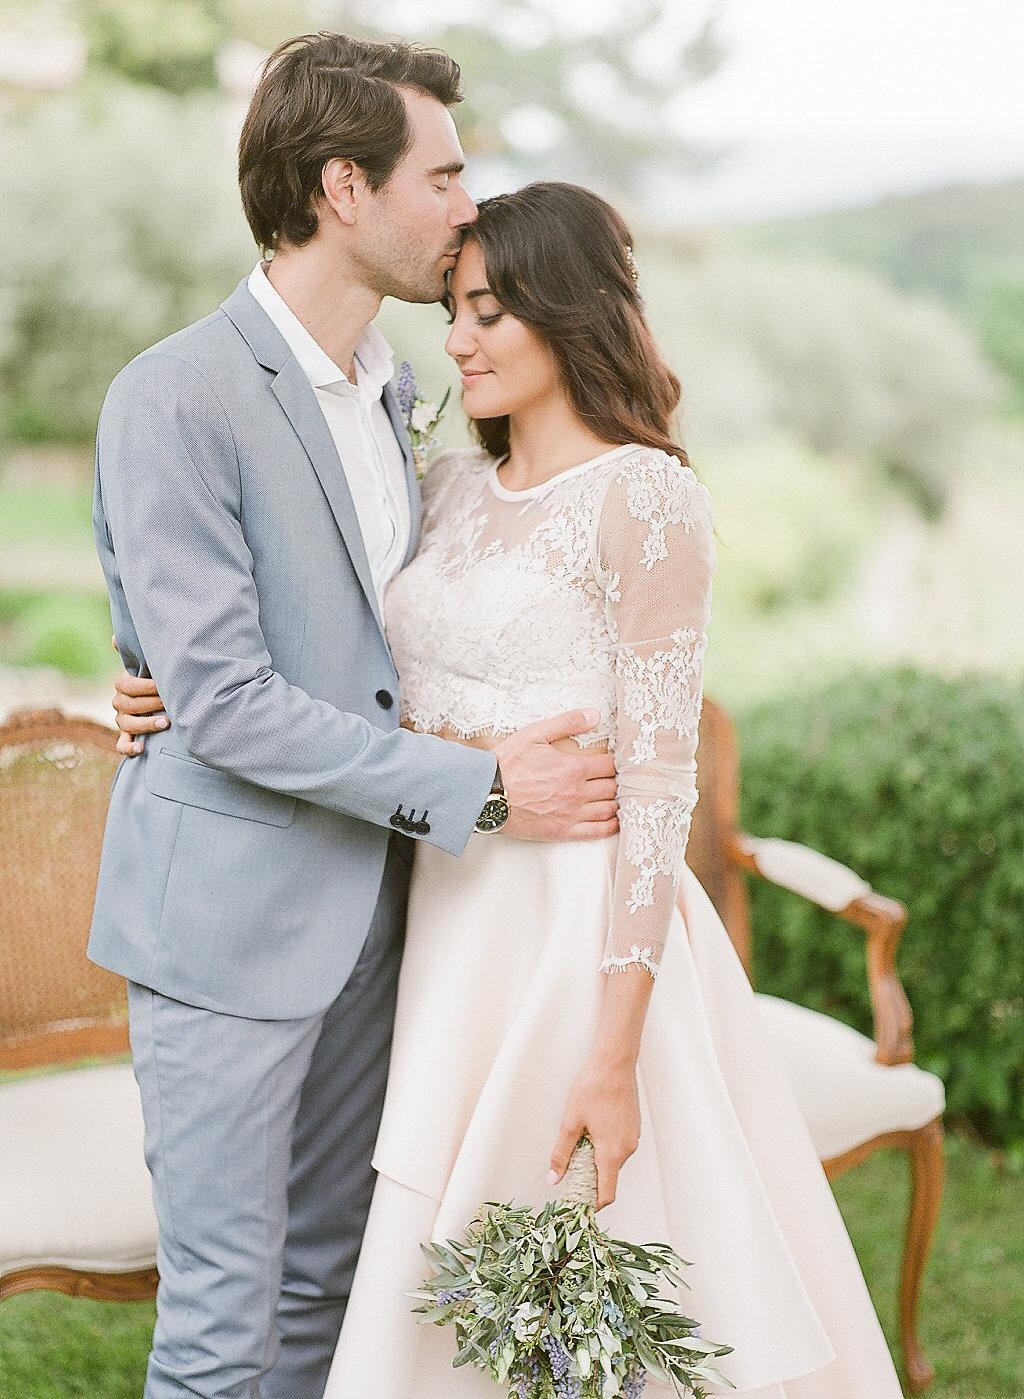 le coeur dans les etoiles - wedding planner - provence - luberon - alpilles - drome - vaucluse - sardaigne - italie - organisation - mariage - shooting - dolce vita - valery villard-320